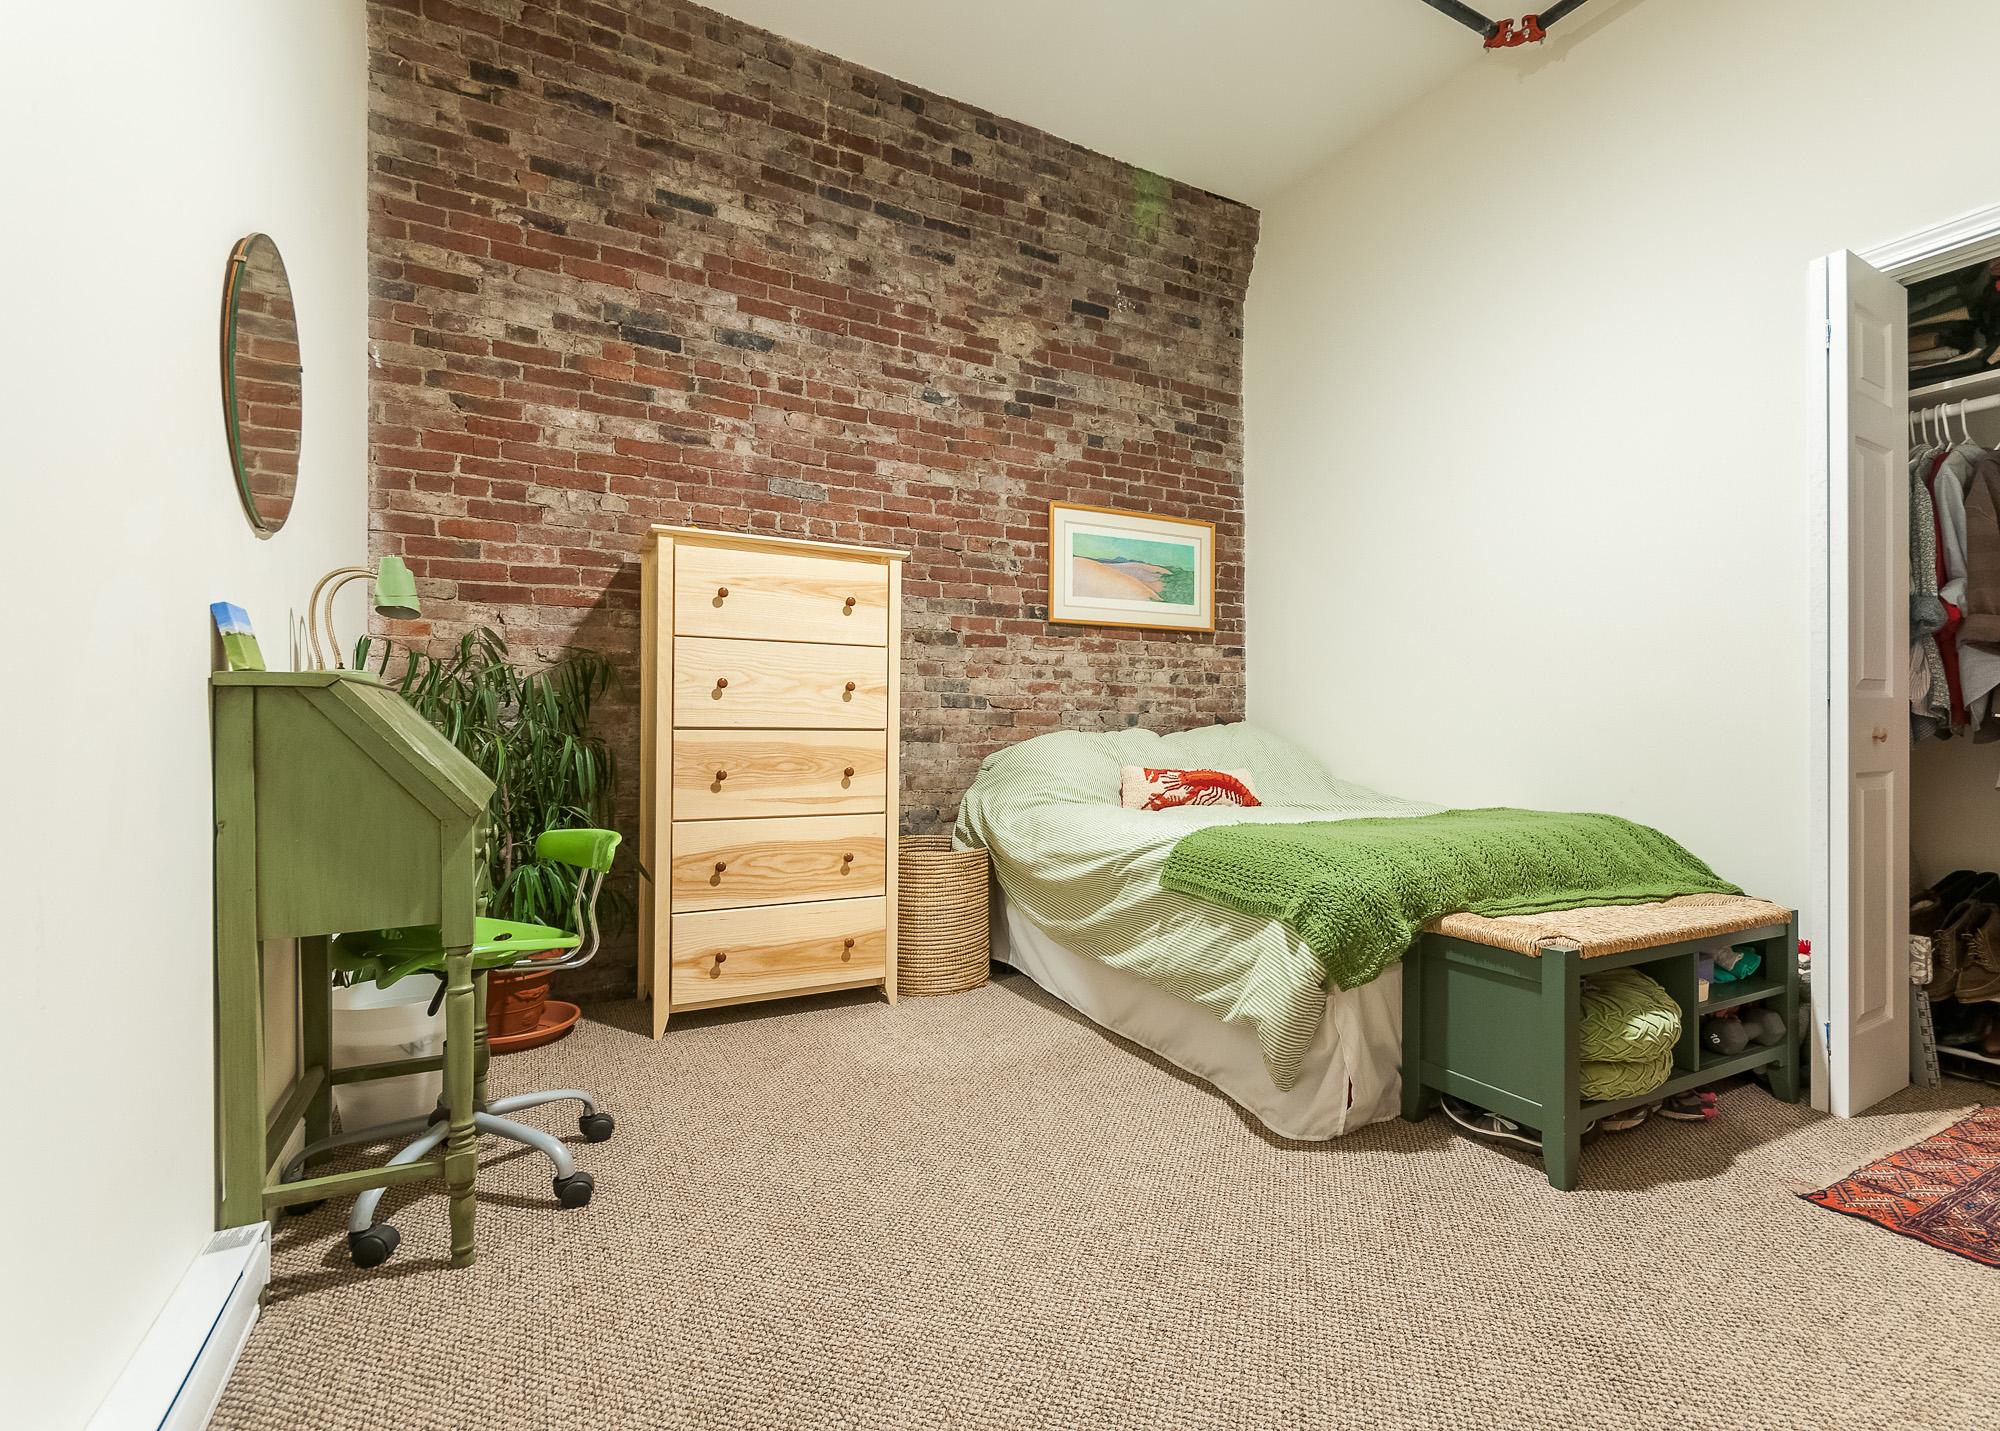 original brick wall in bedroom